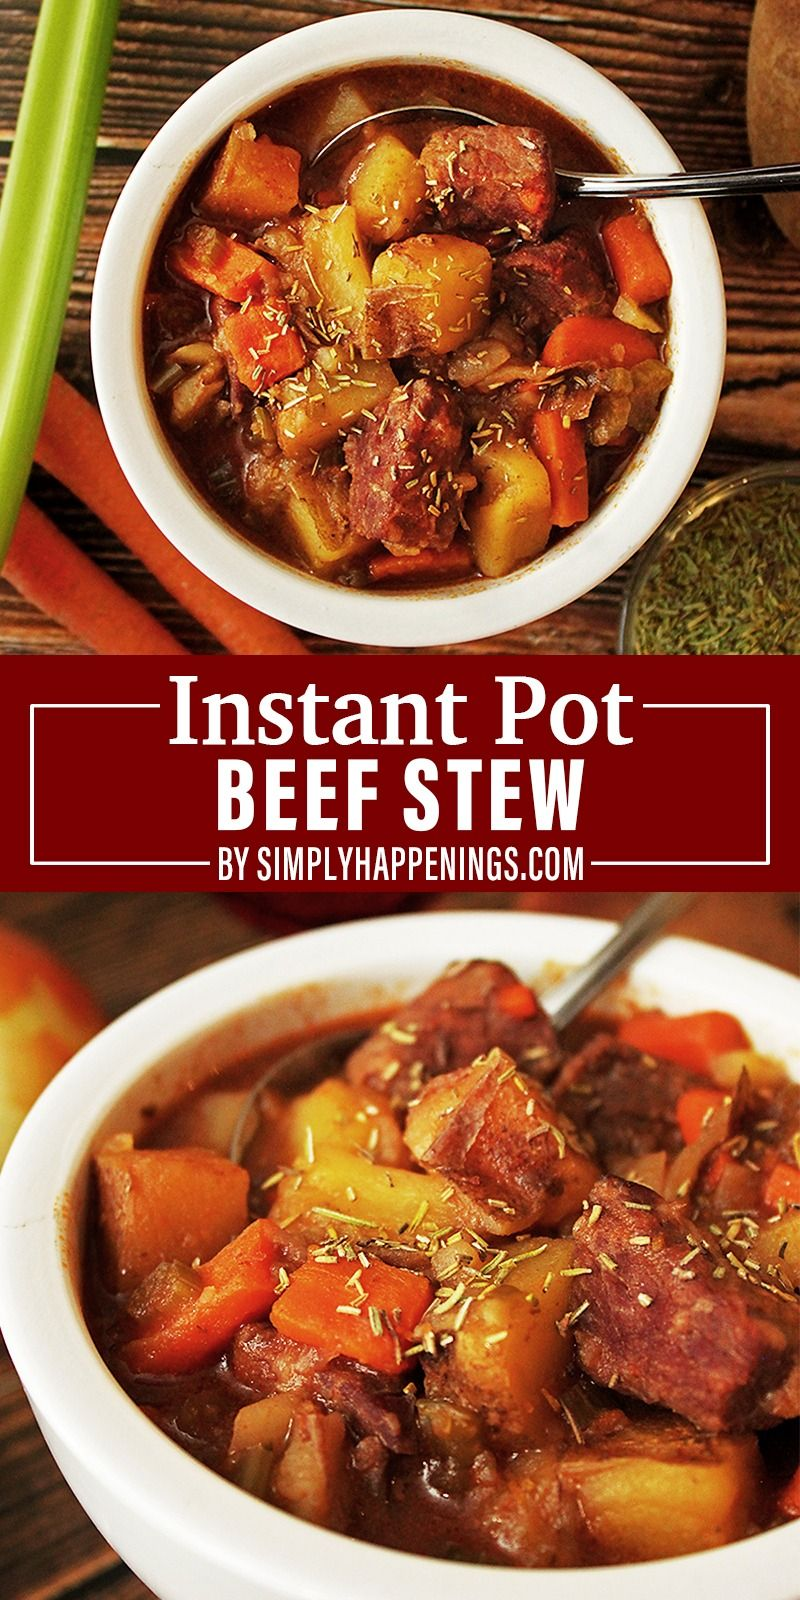 Easiest Instant Pot Beef Stew Simply Happenings Recipe In 2020 Instant Pot Beef Pot Beef Stew Potted Beef